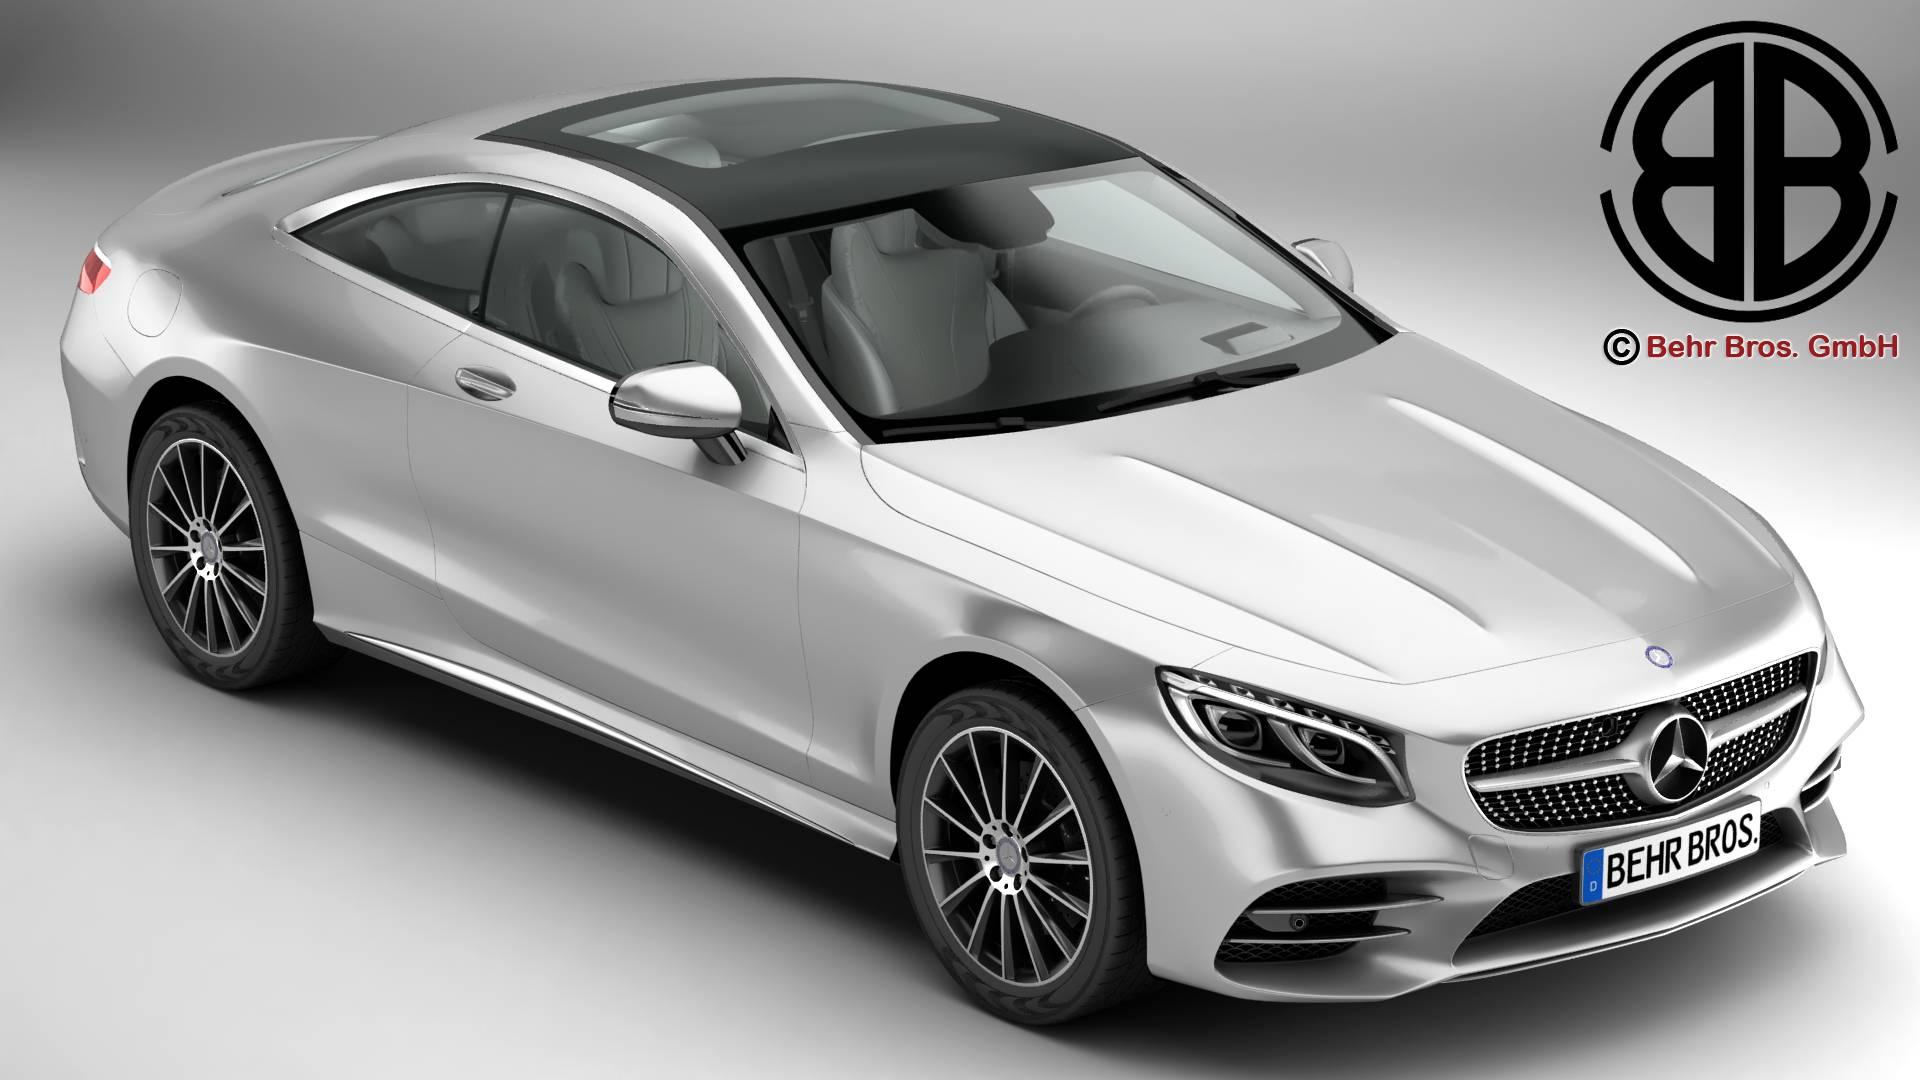 Mercedes S Class Coupe AMG Line 2018 3d model 3ds max fbx c4d lwo lws lw ma mb obj 275658